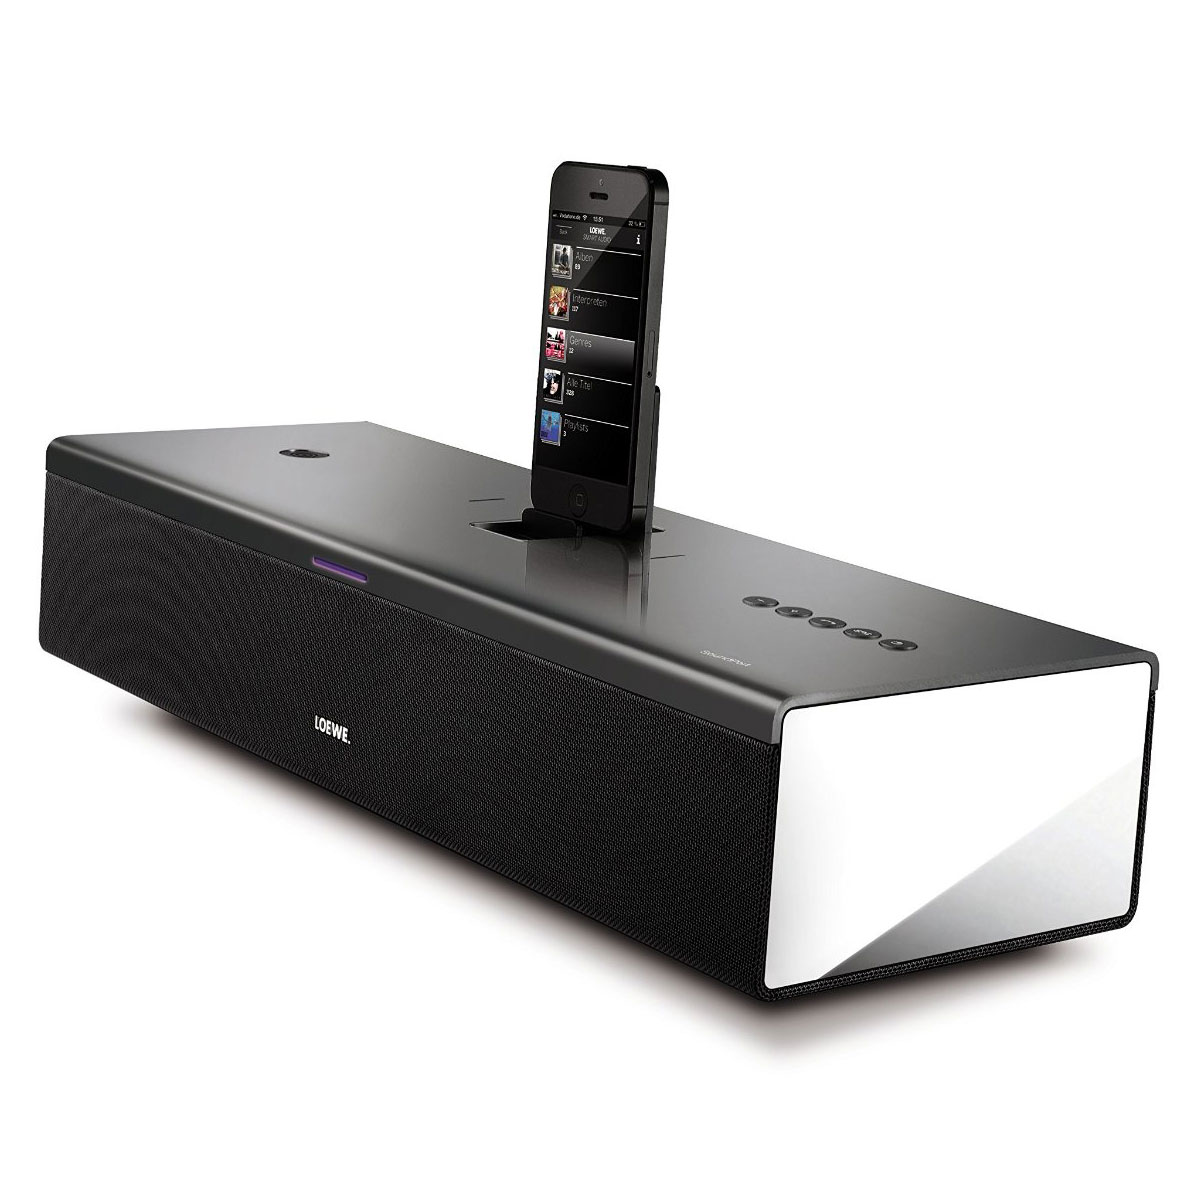 loewe soundport compact noir dock enceinte bluetooth. Black Bedroom Furniture Sets. Home Design Ideas